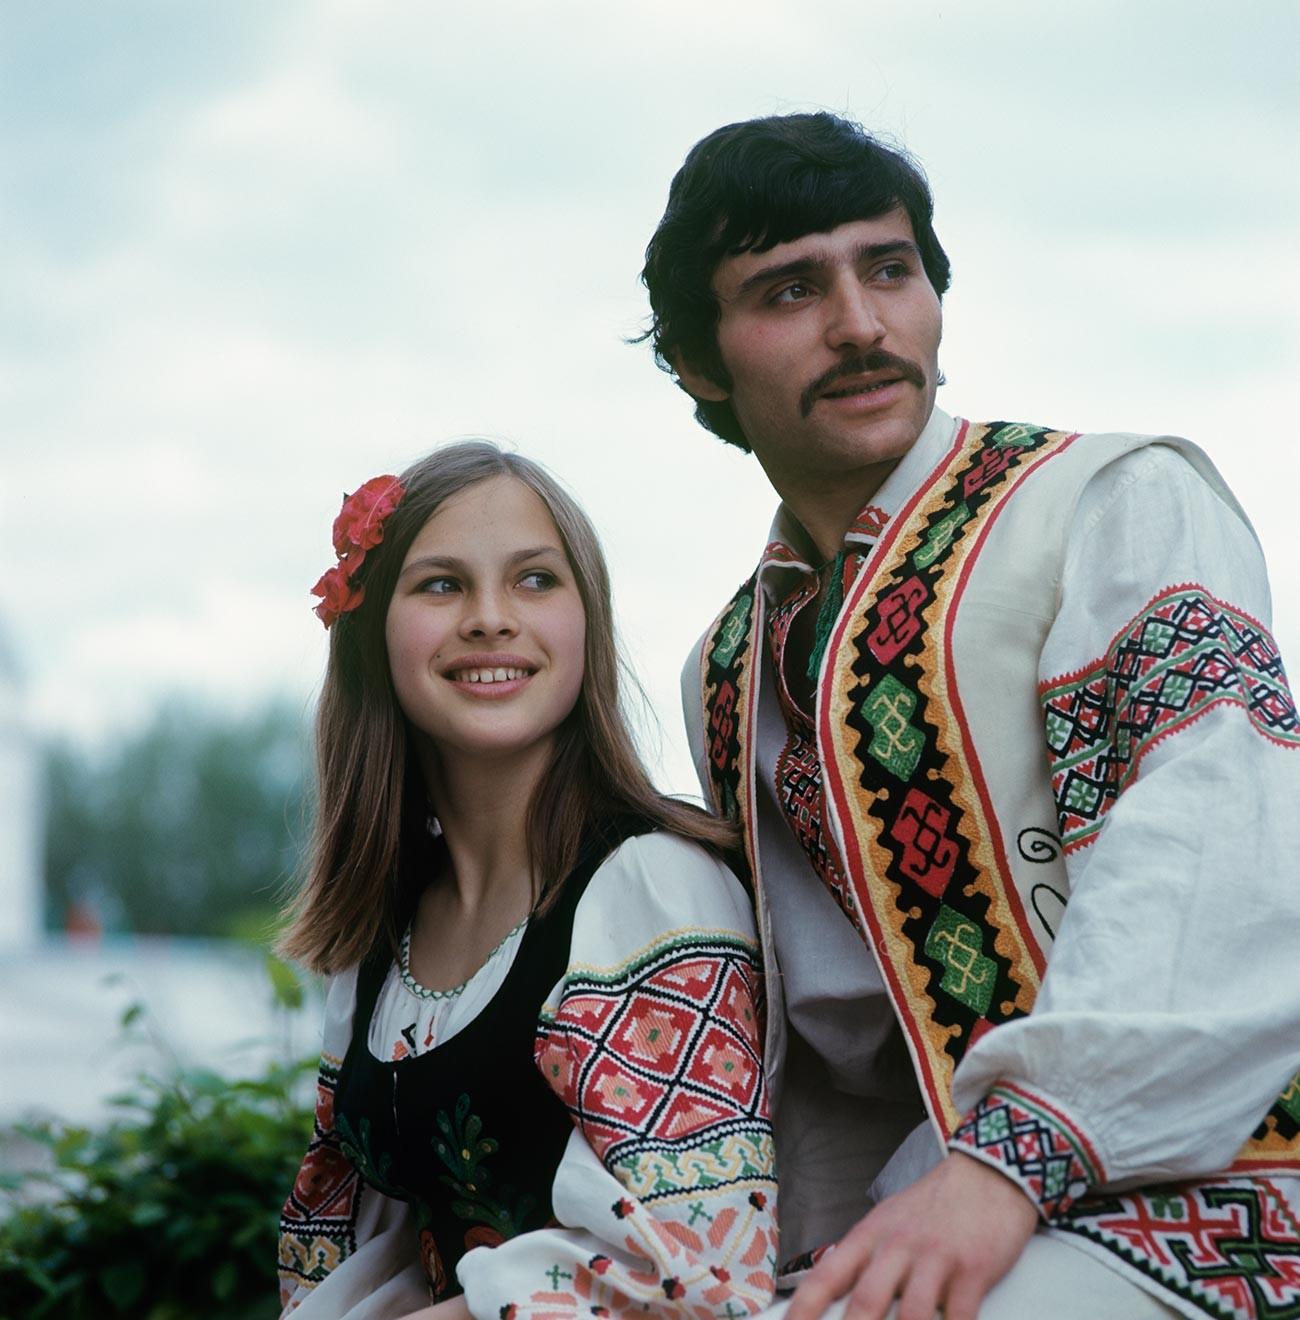 Miembros del grupo de danza folclórica Moldavanesca, 1975.